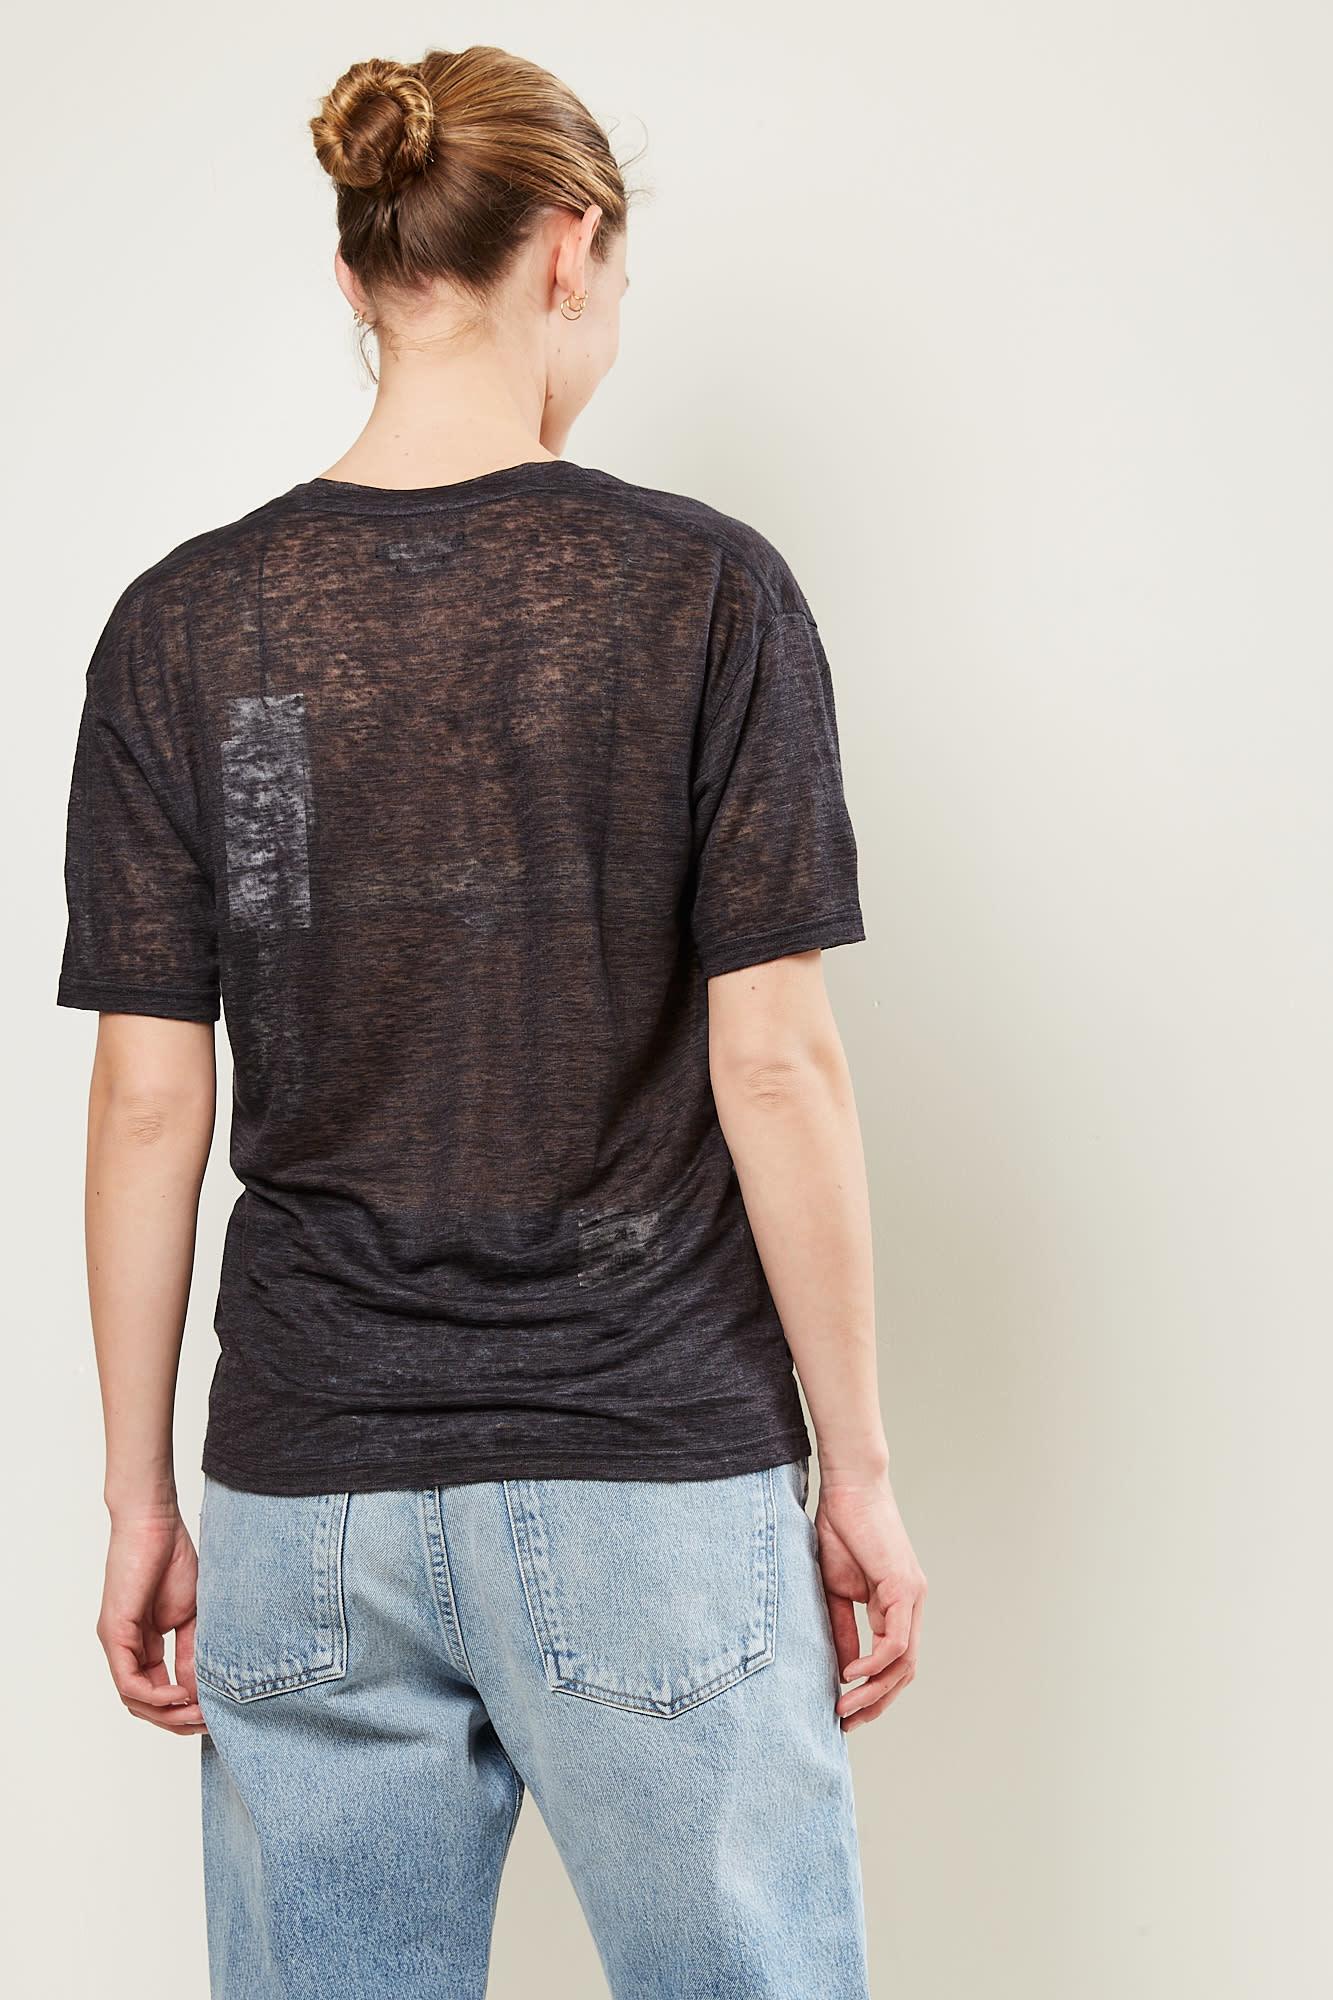 Isabel Marant - Maree soft tee shirt black